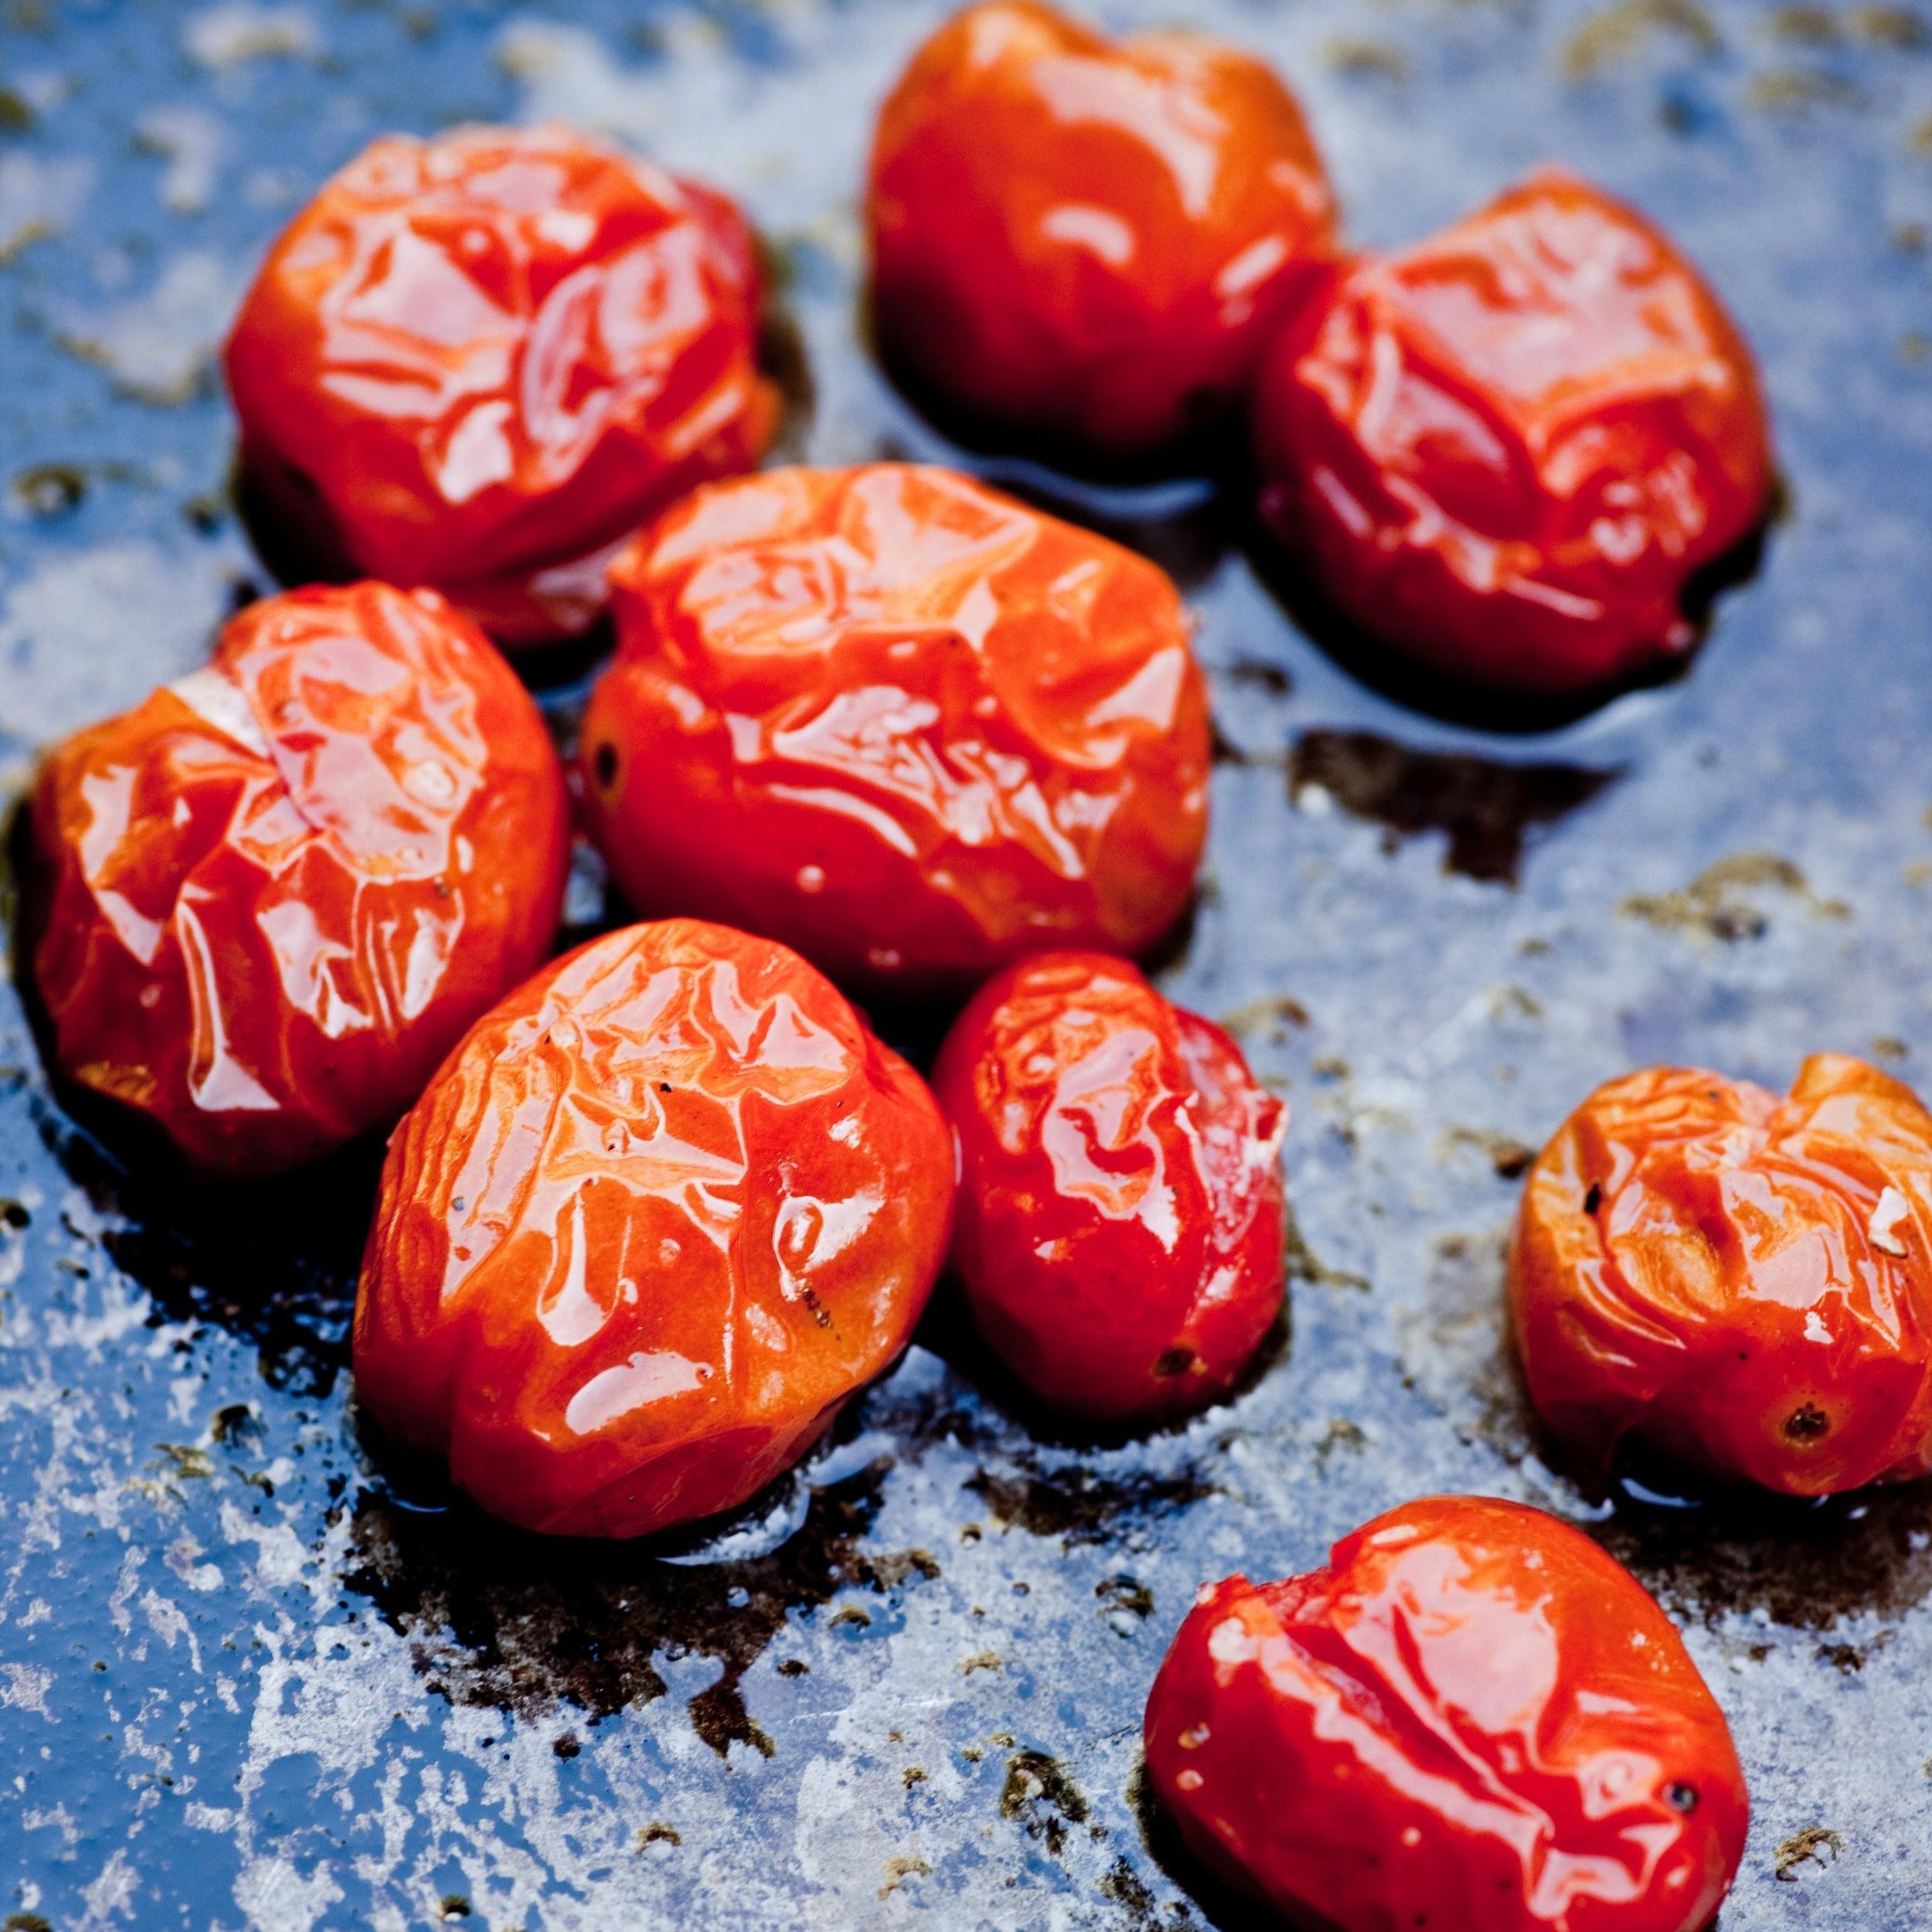 roasted tomatoes-sara_shoot5_0265 copy.jpg